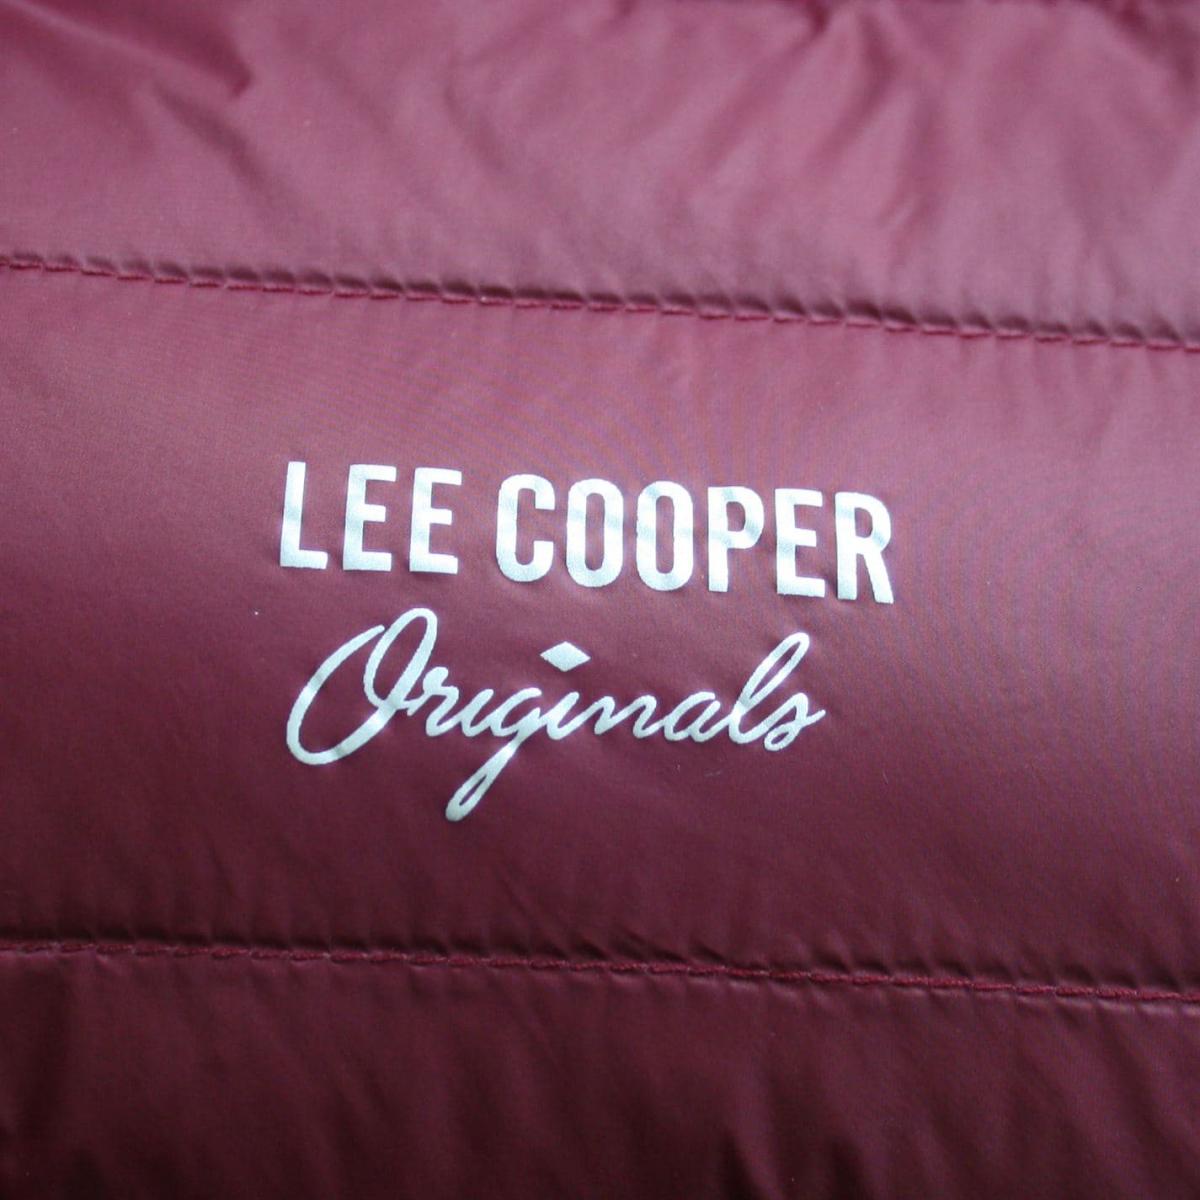 Lee Cooper Xlite Down Winterjacke Jacke Herren Burgundy